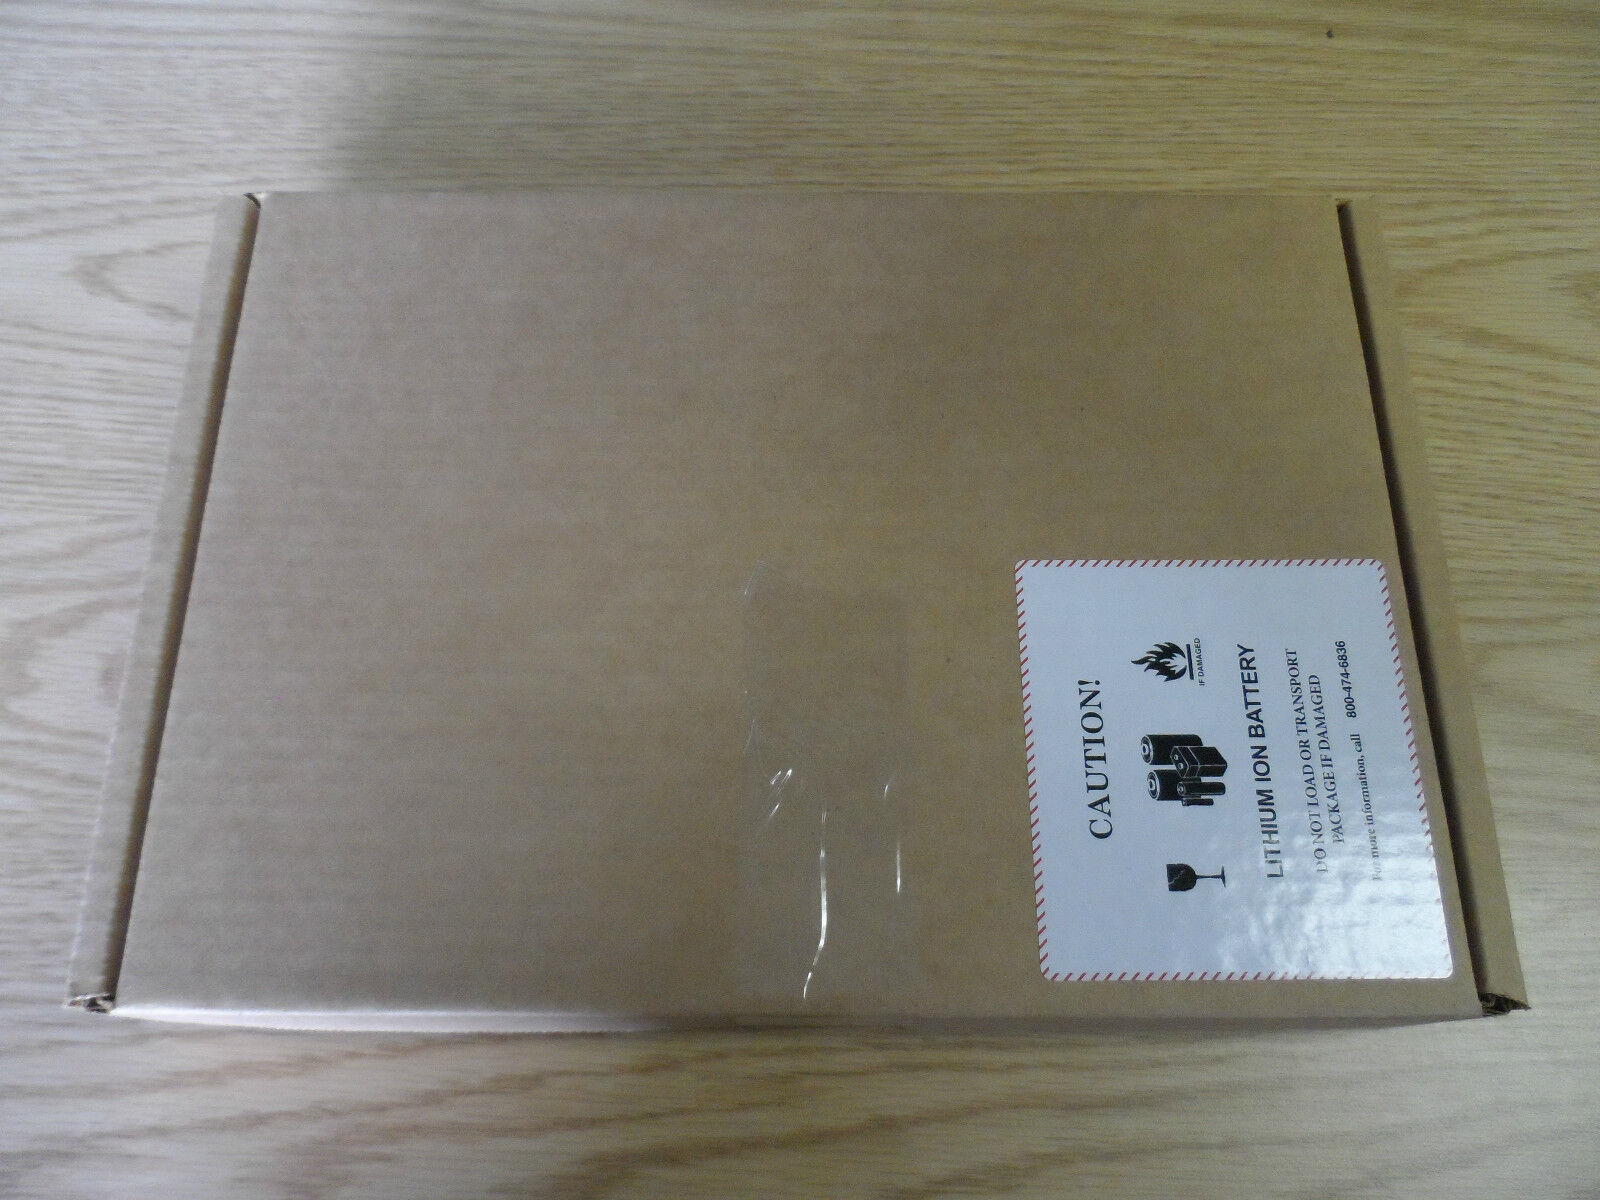 Toshiba Satellite L300 L305 Intel Socket 478 Laptop Mothe...